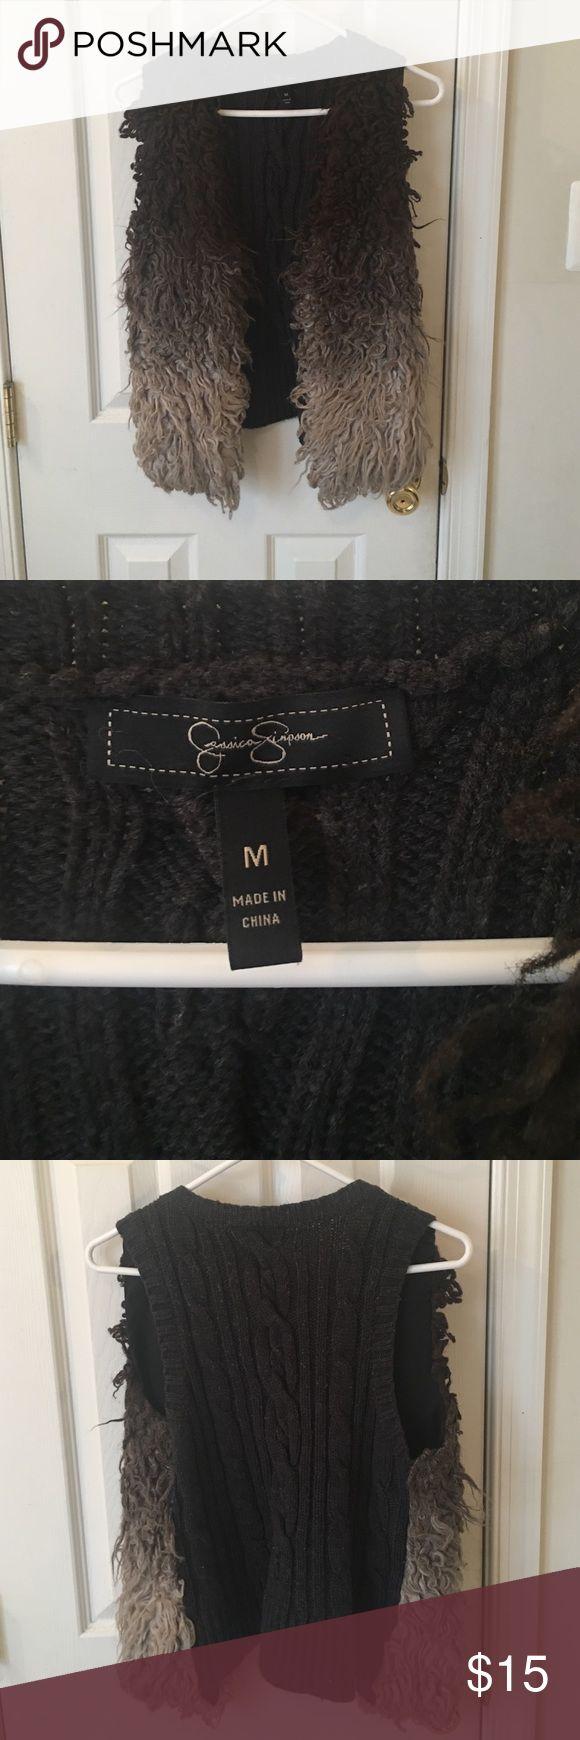 Jessica Simpson size medium sweater shaggy vest Jessica Simpson size medium sweater shaggy vest Jessica Simpson Jackets & Coats Vests